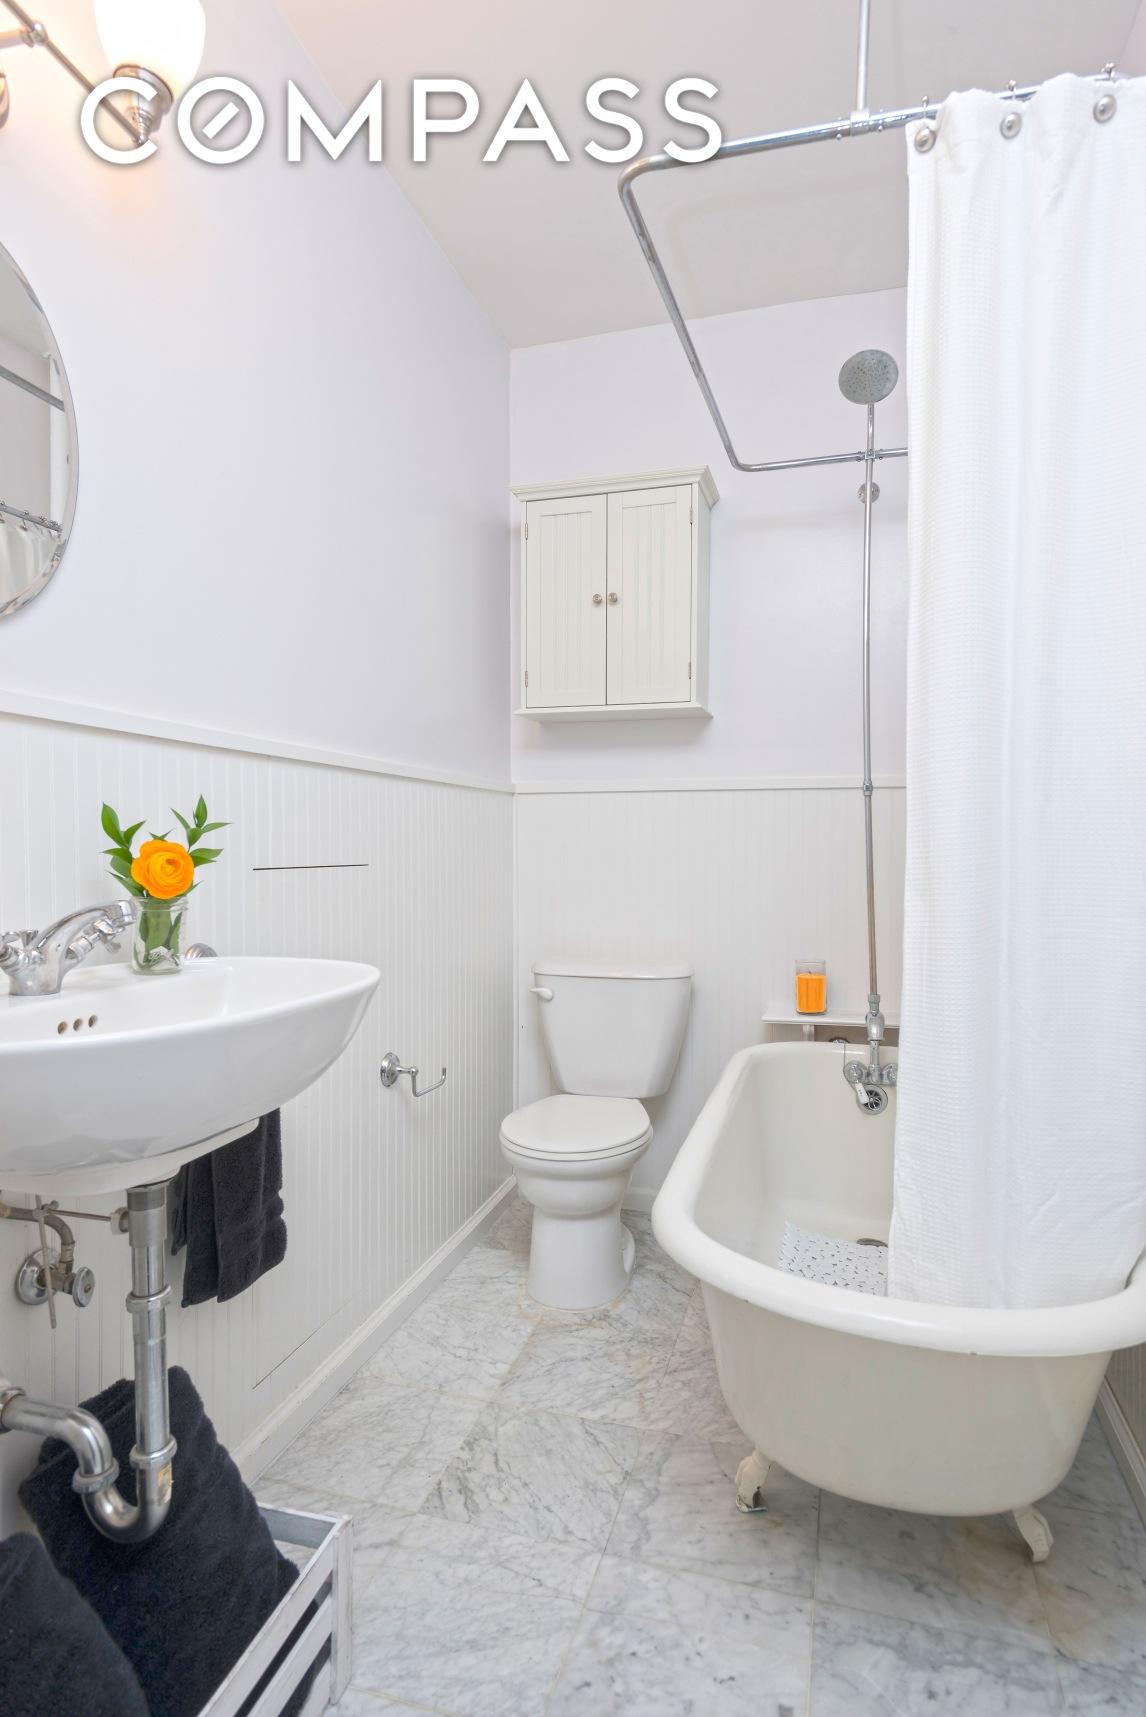 bathroom c chrome metal faucet handles monroe bridge plumbing side lever with